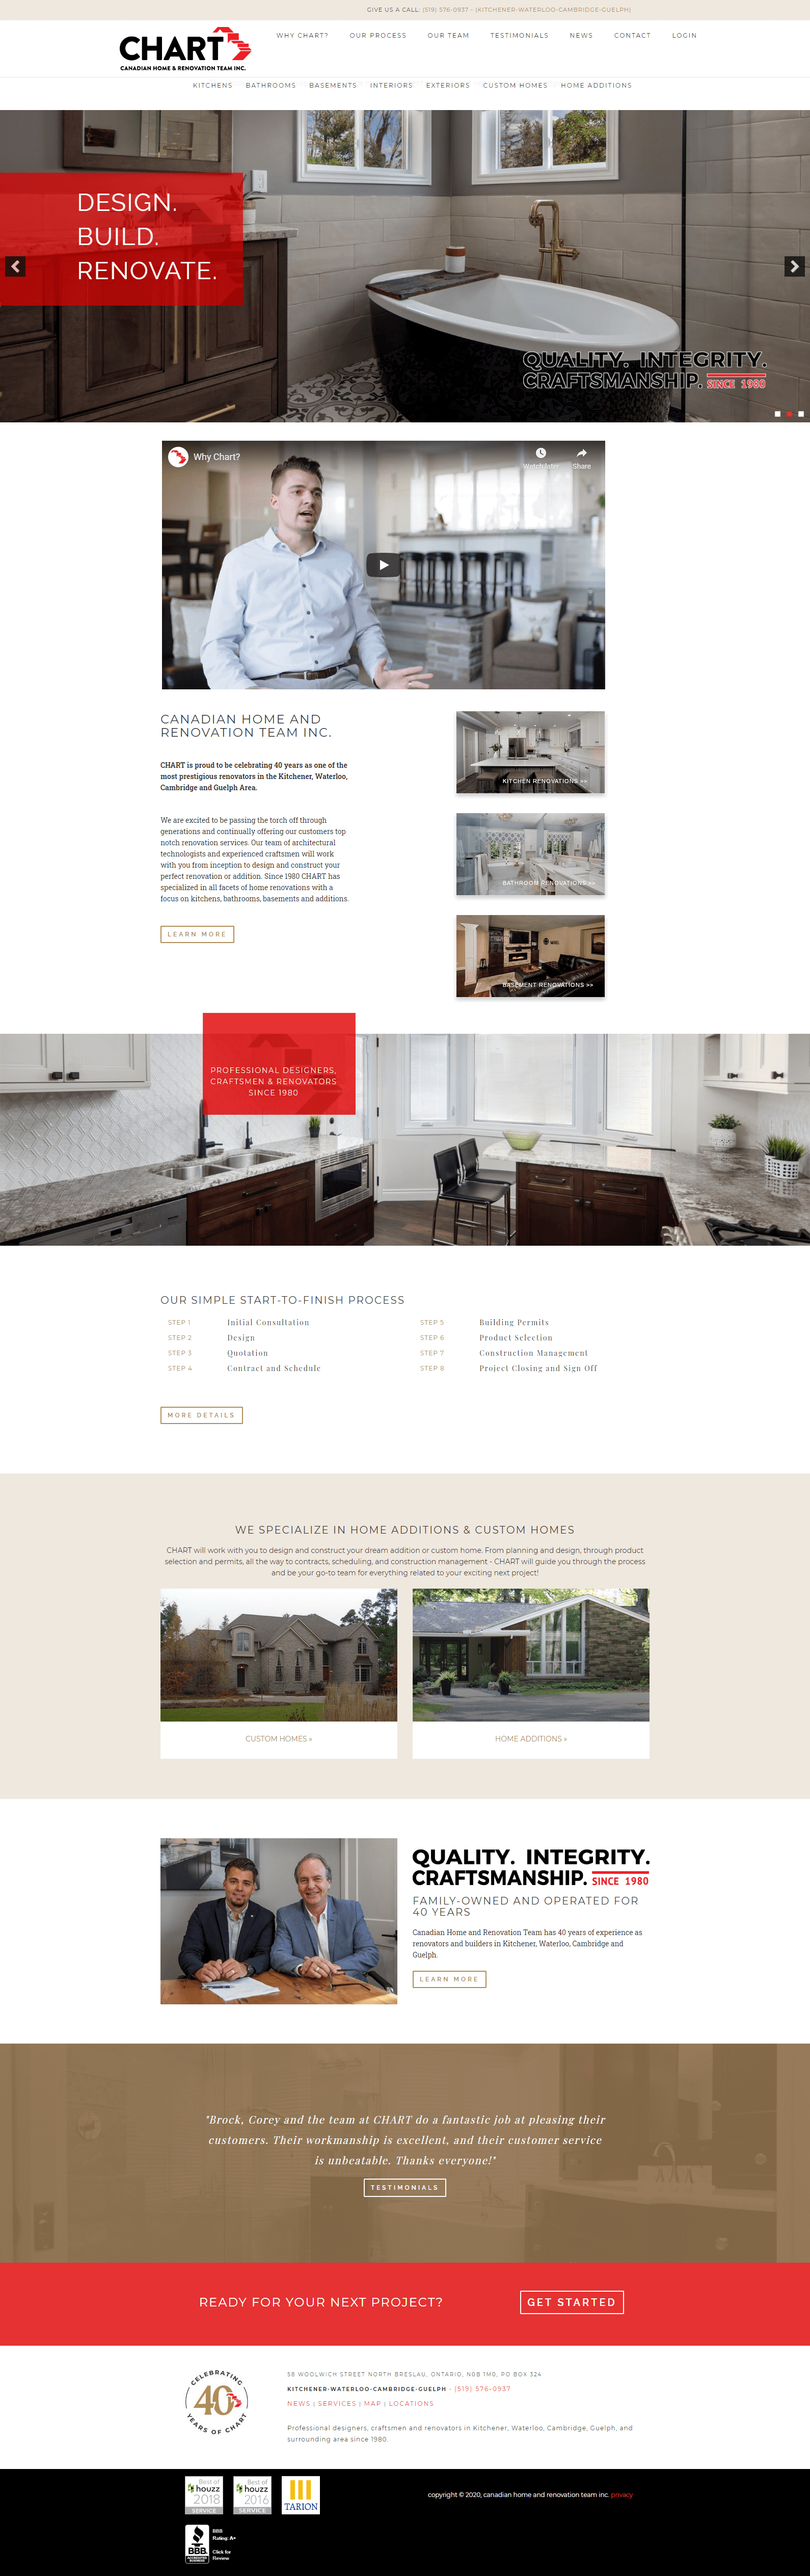 Screen shot CHART home page